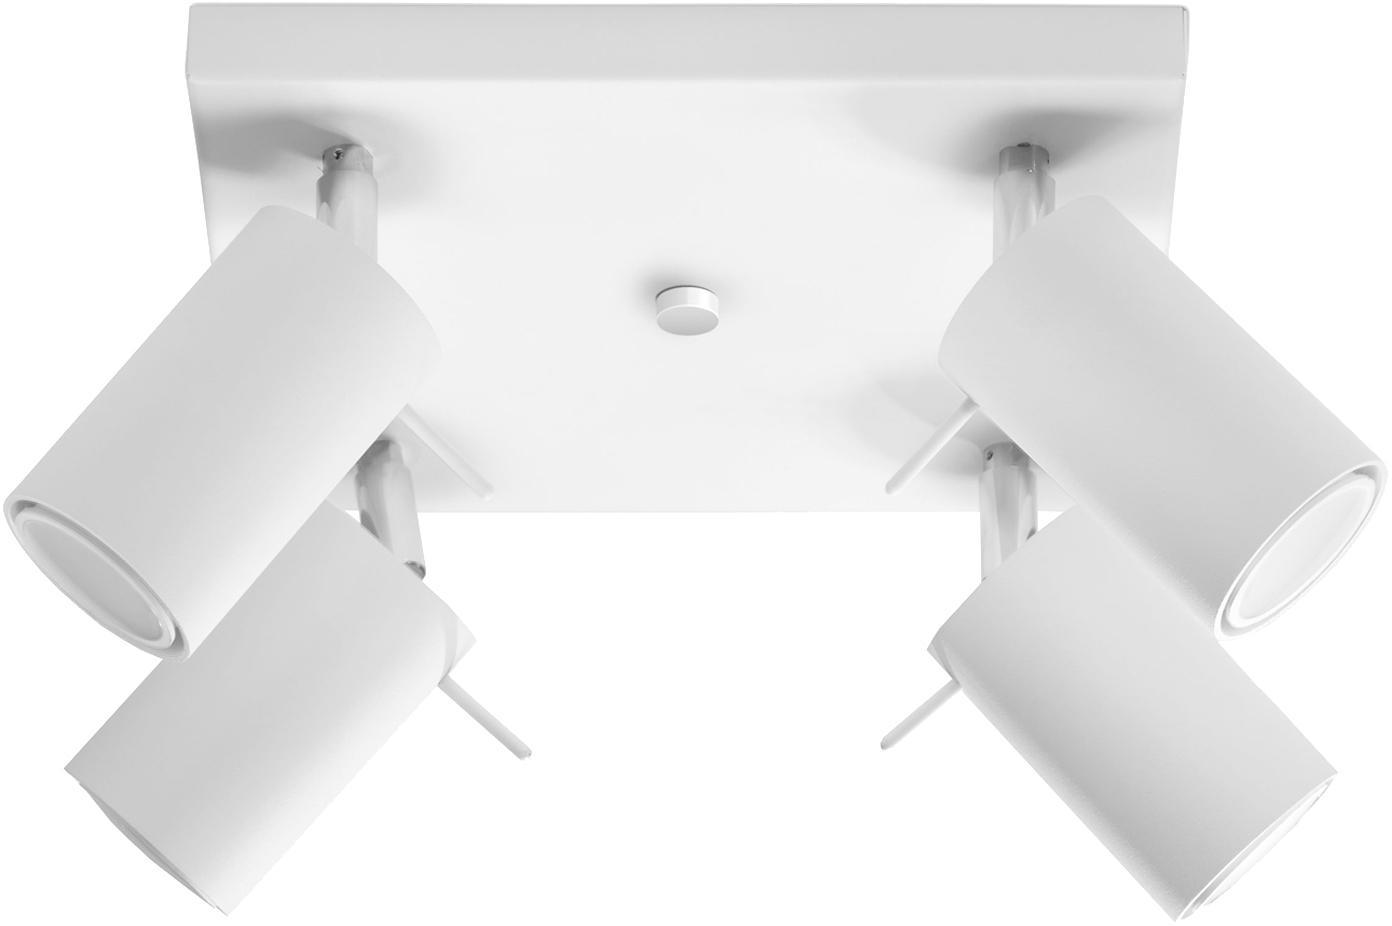 Plafondlamp Etna, Staal, Wit, 25 x 15 cm